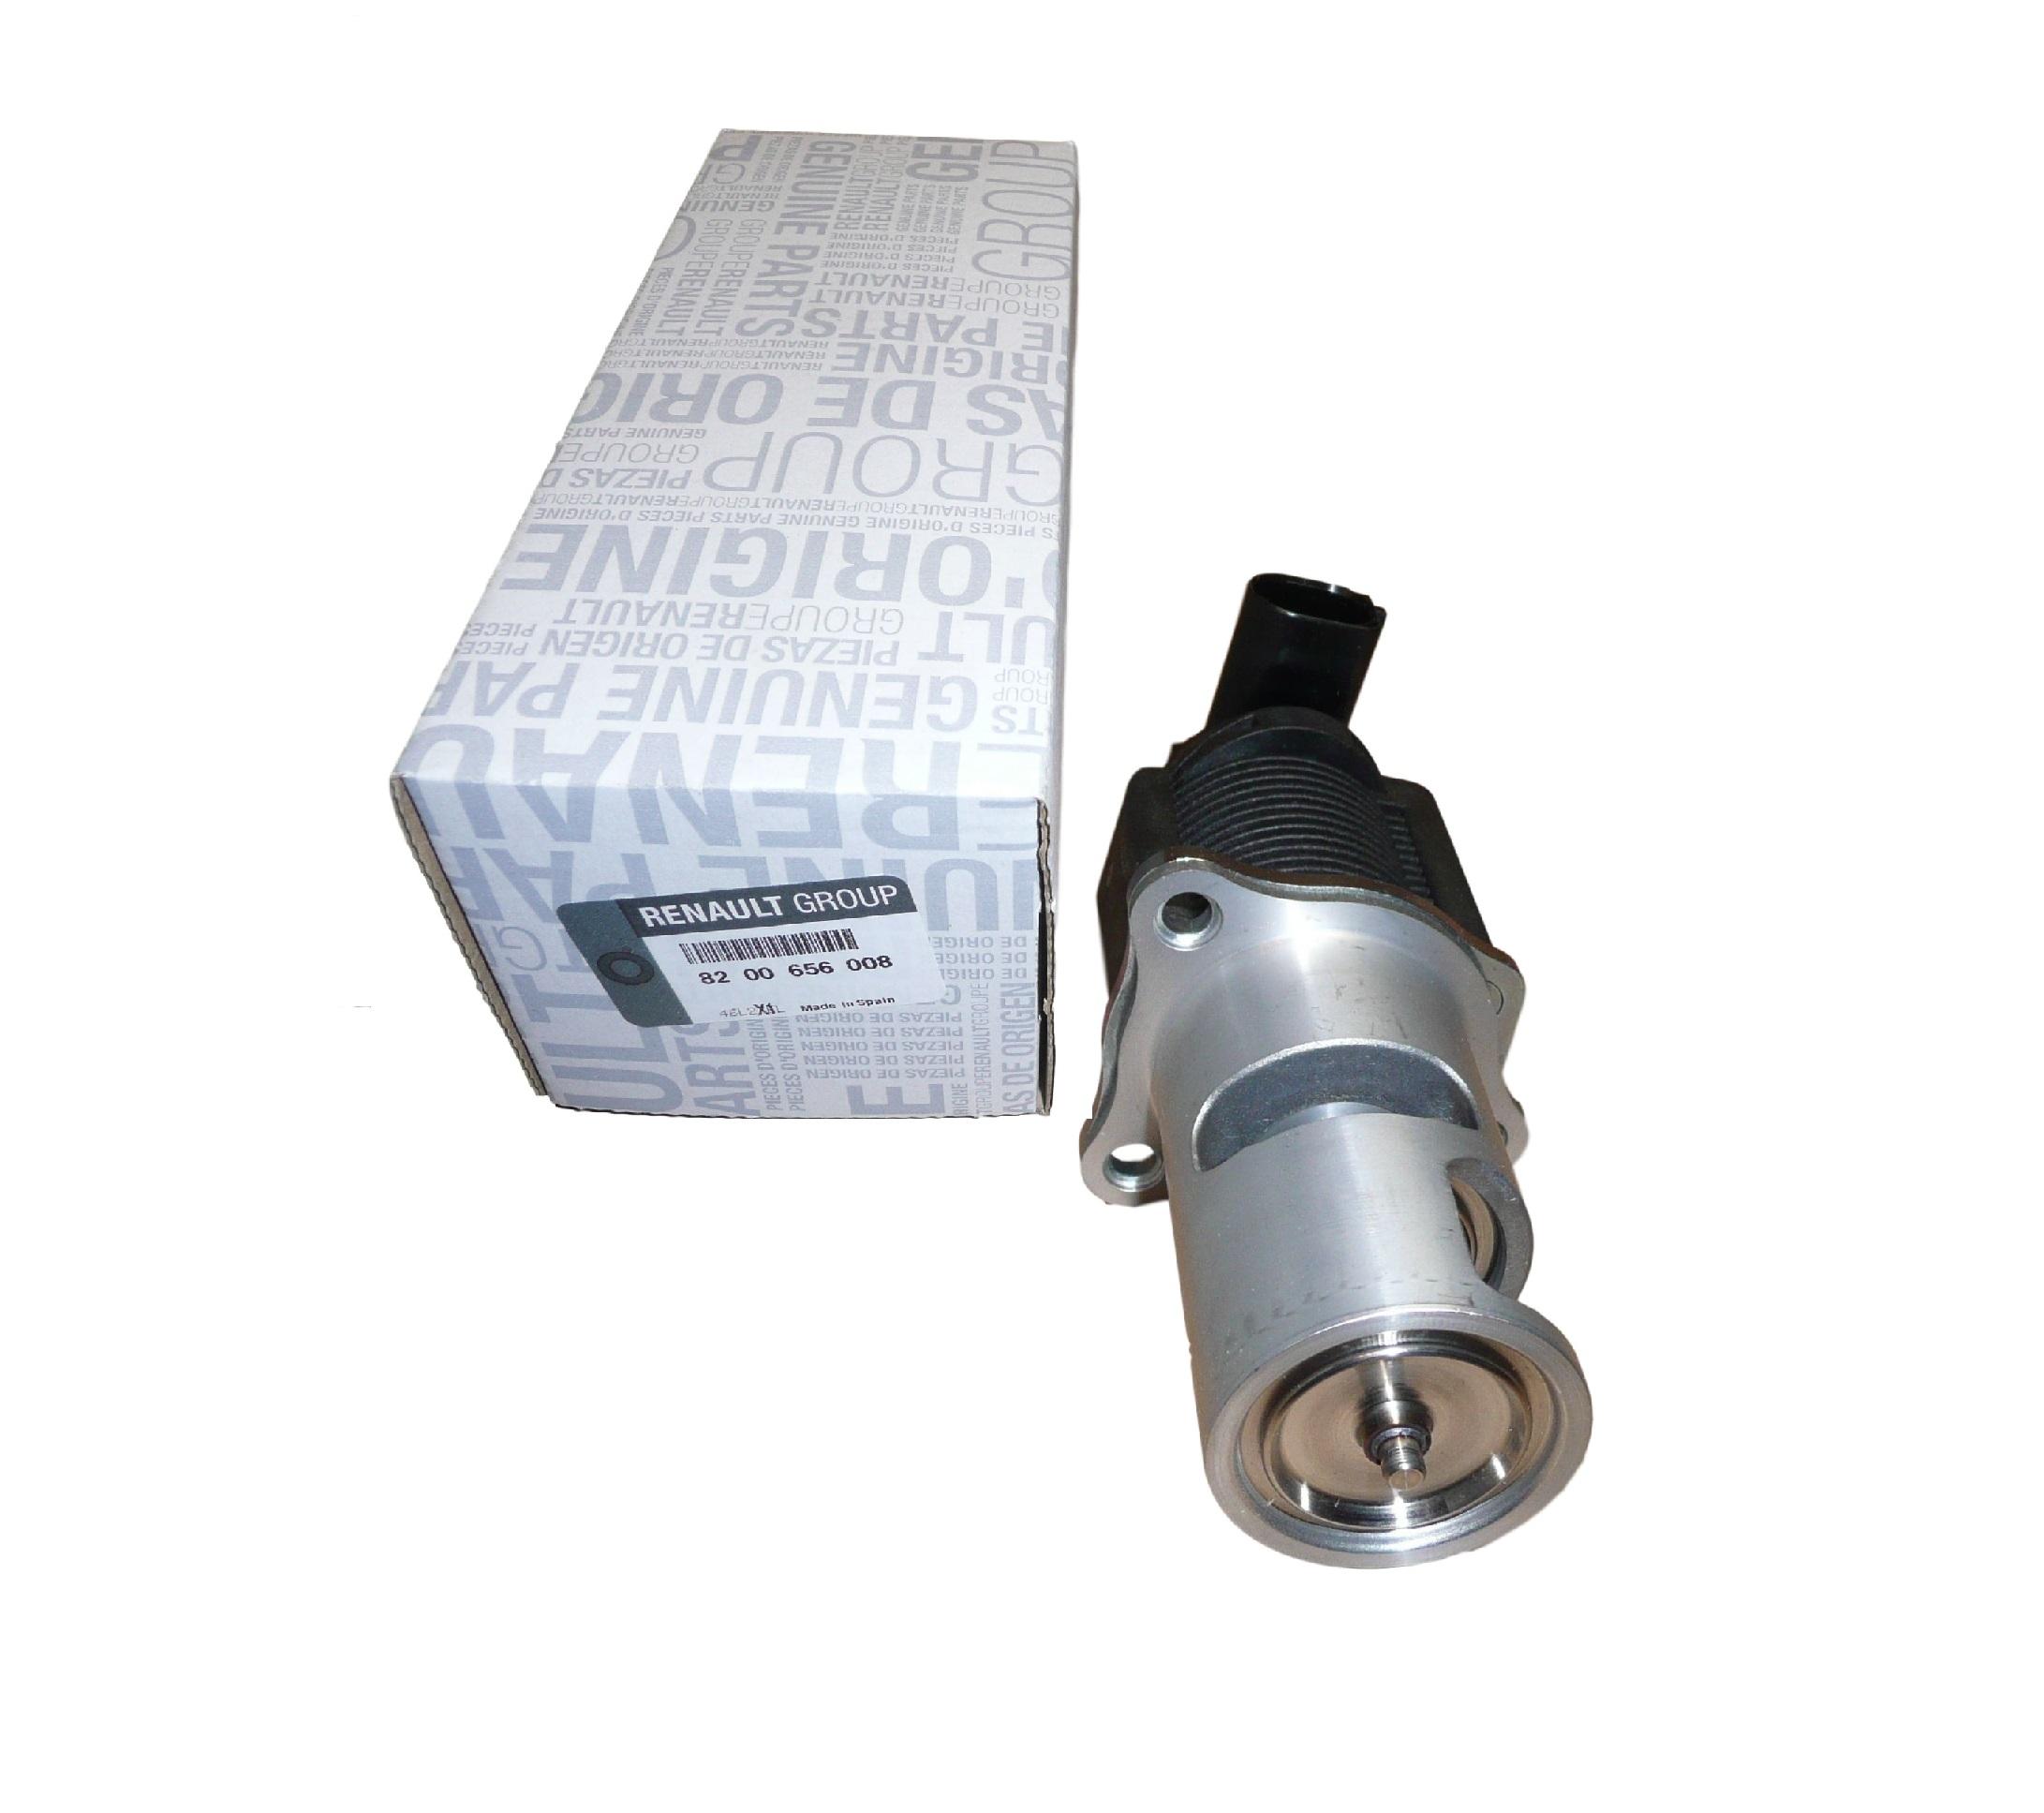 клапан системы рециркуляции ог renault dacia 15dci 8200656008 оригинал